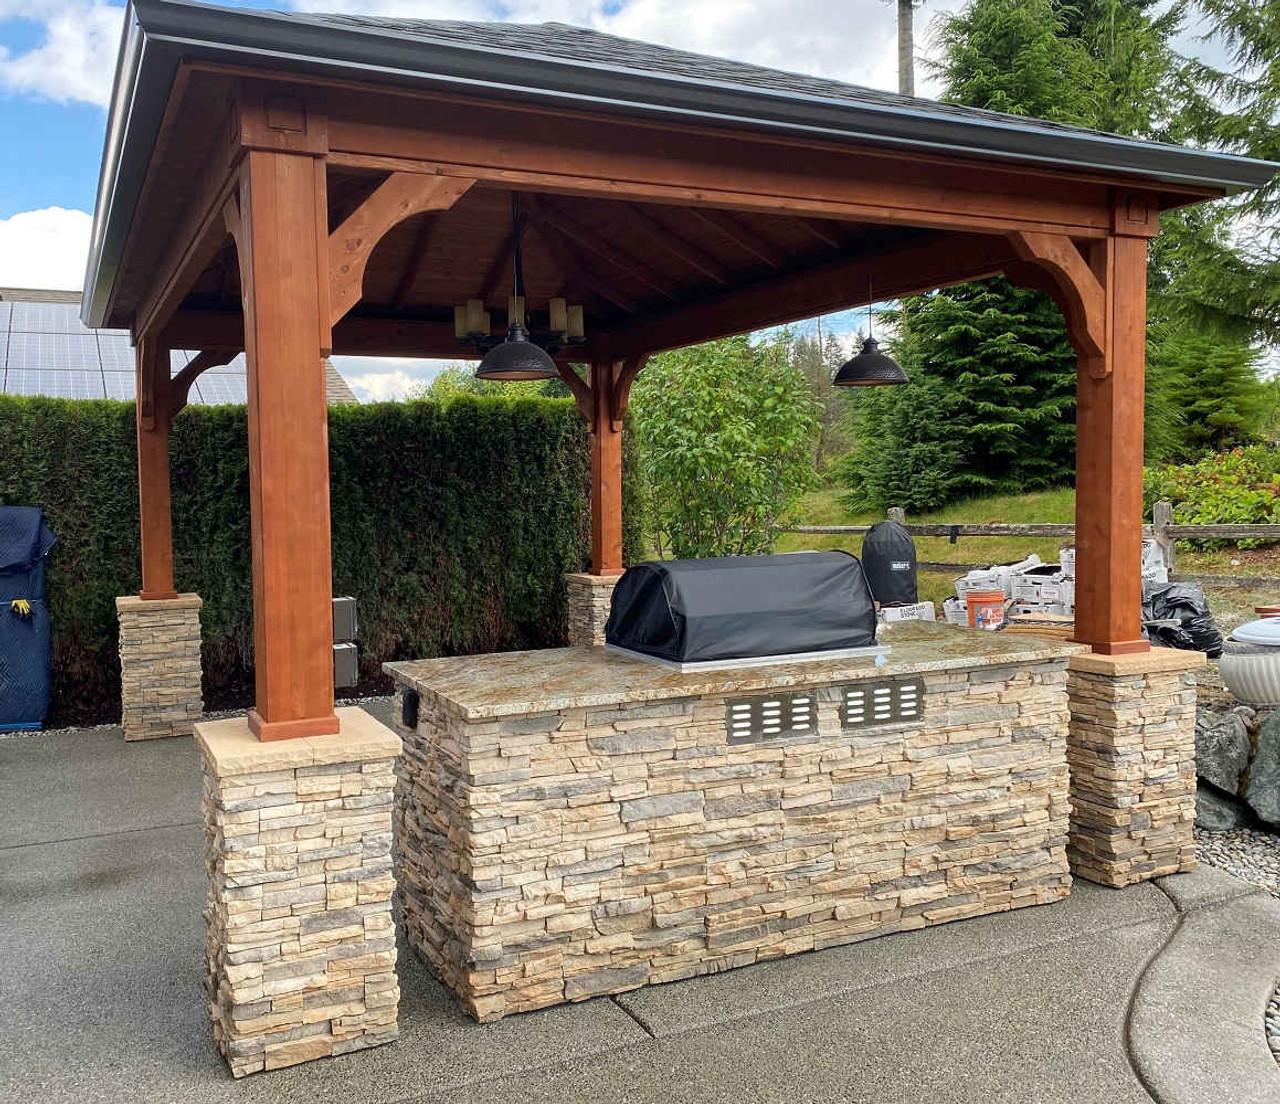 12x16 Traditional Roof Cedar Pavilion Kit, Redmond, Washington